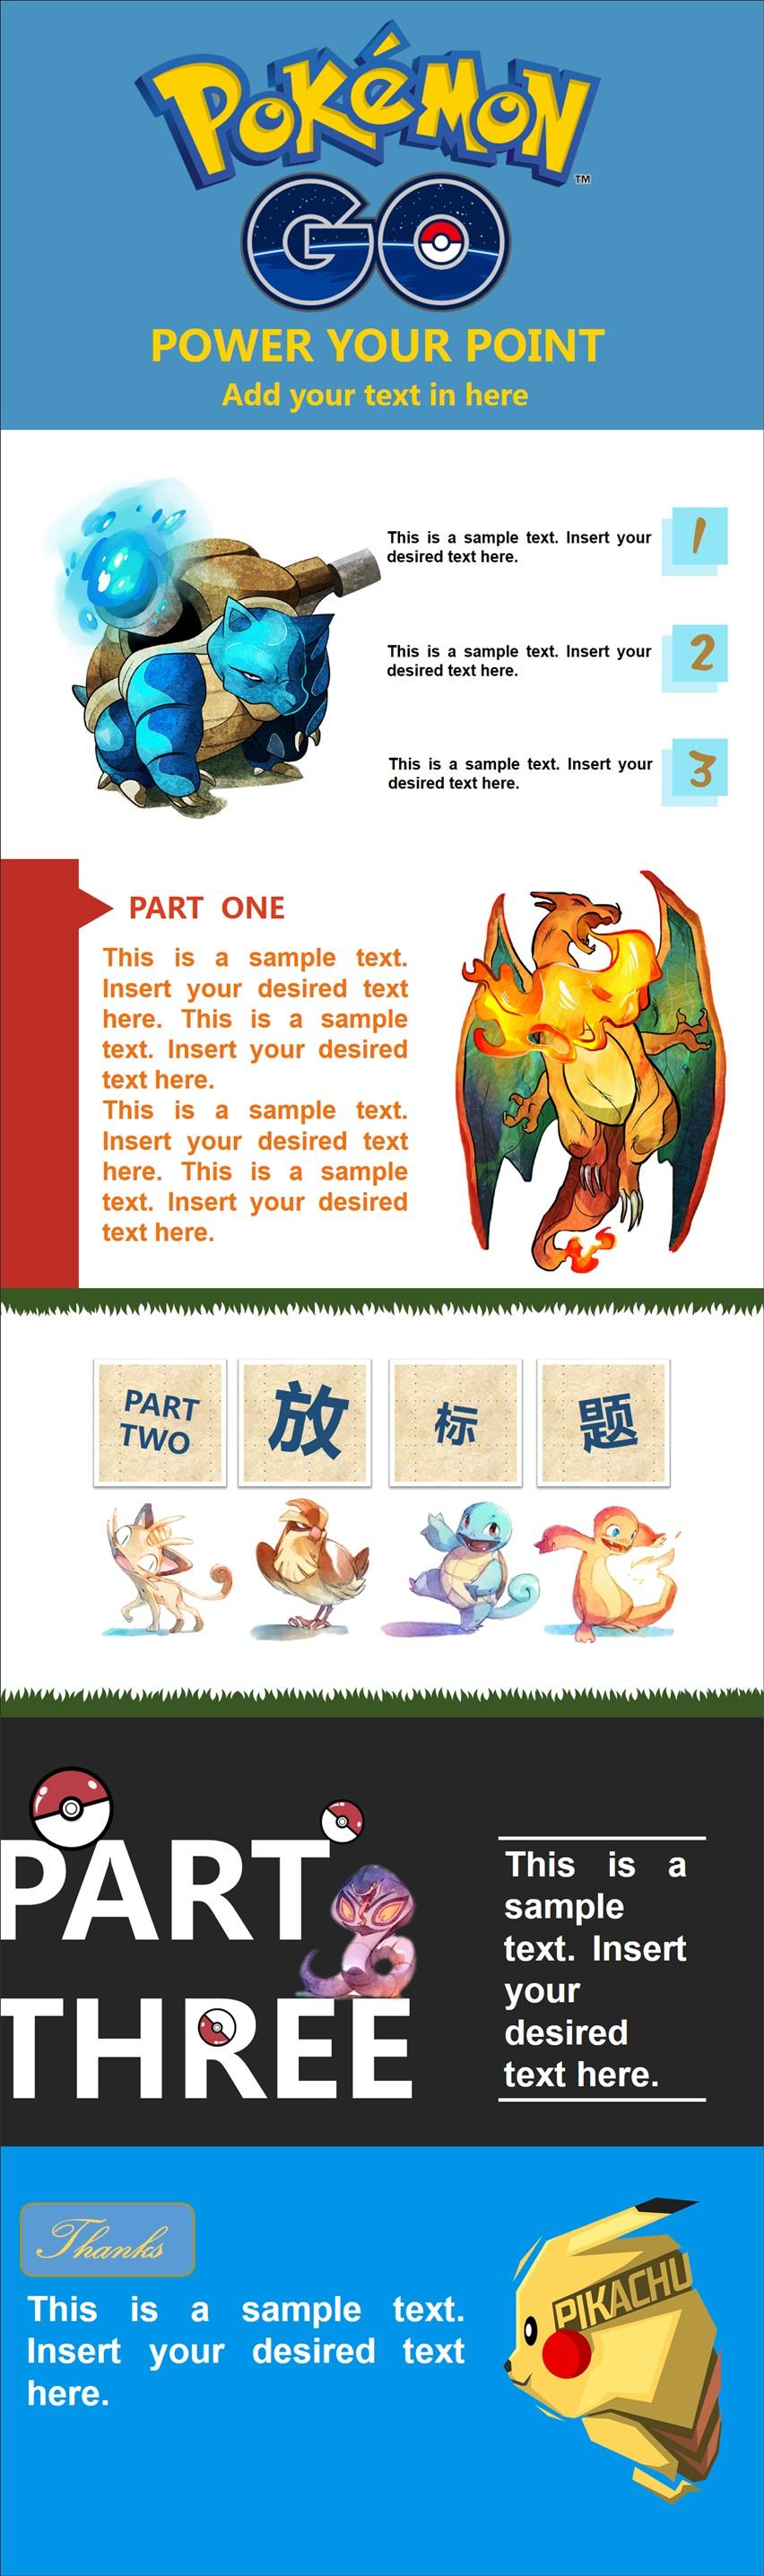 "免费ppt模板Pokemon GO模板ppt下载"""